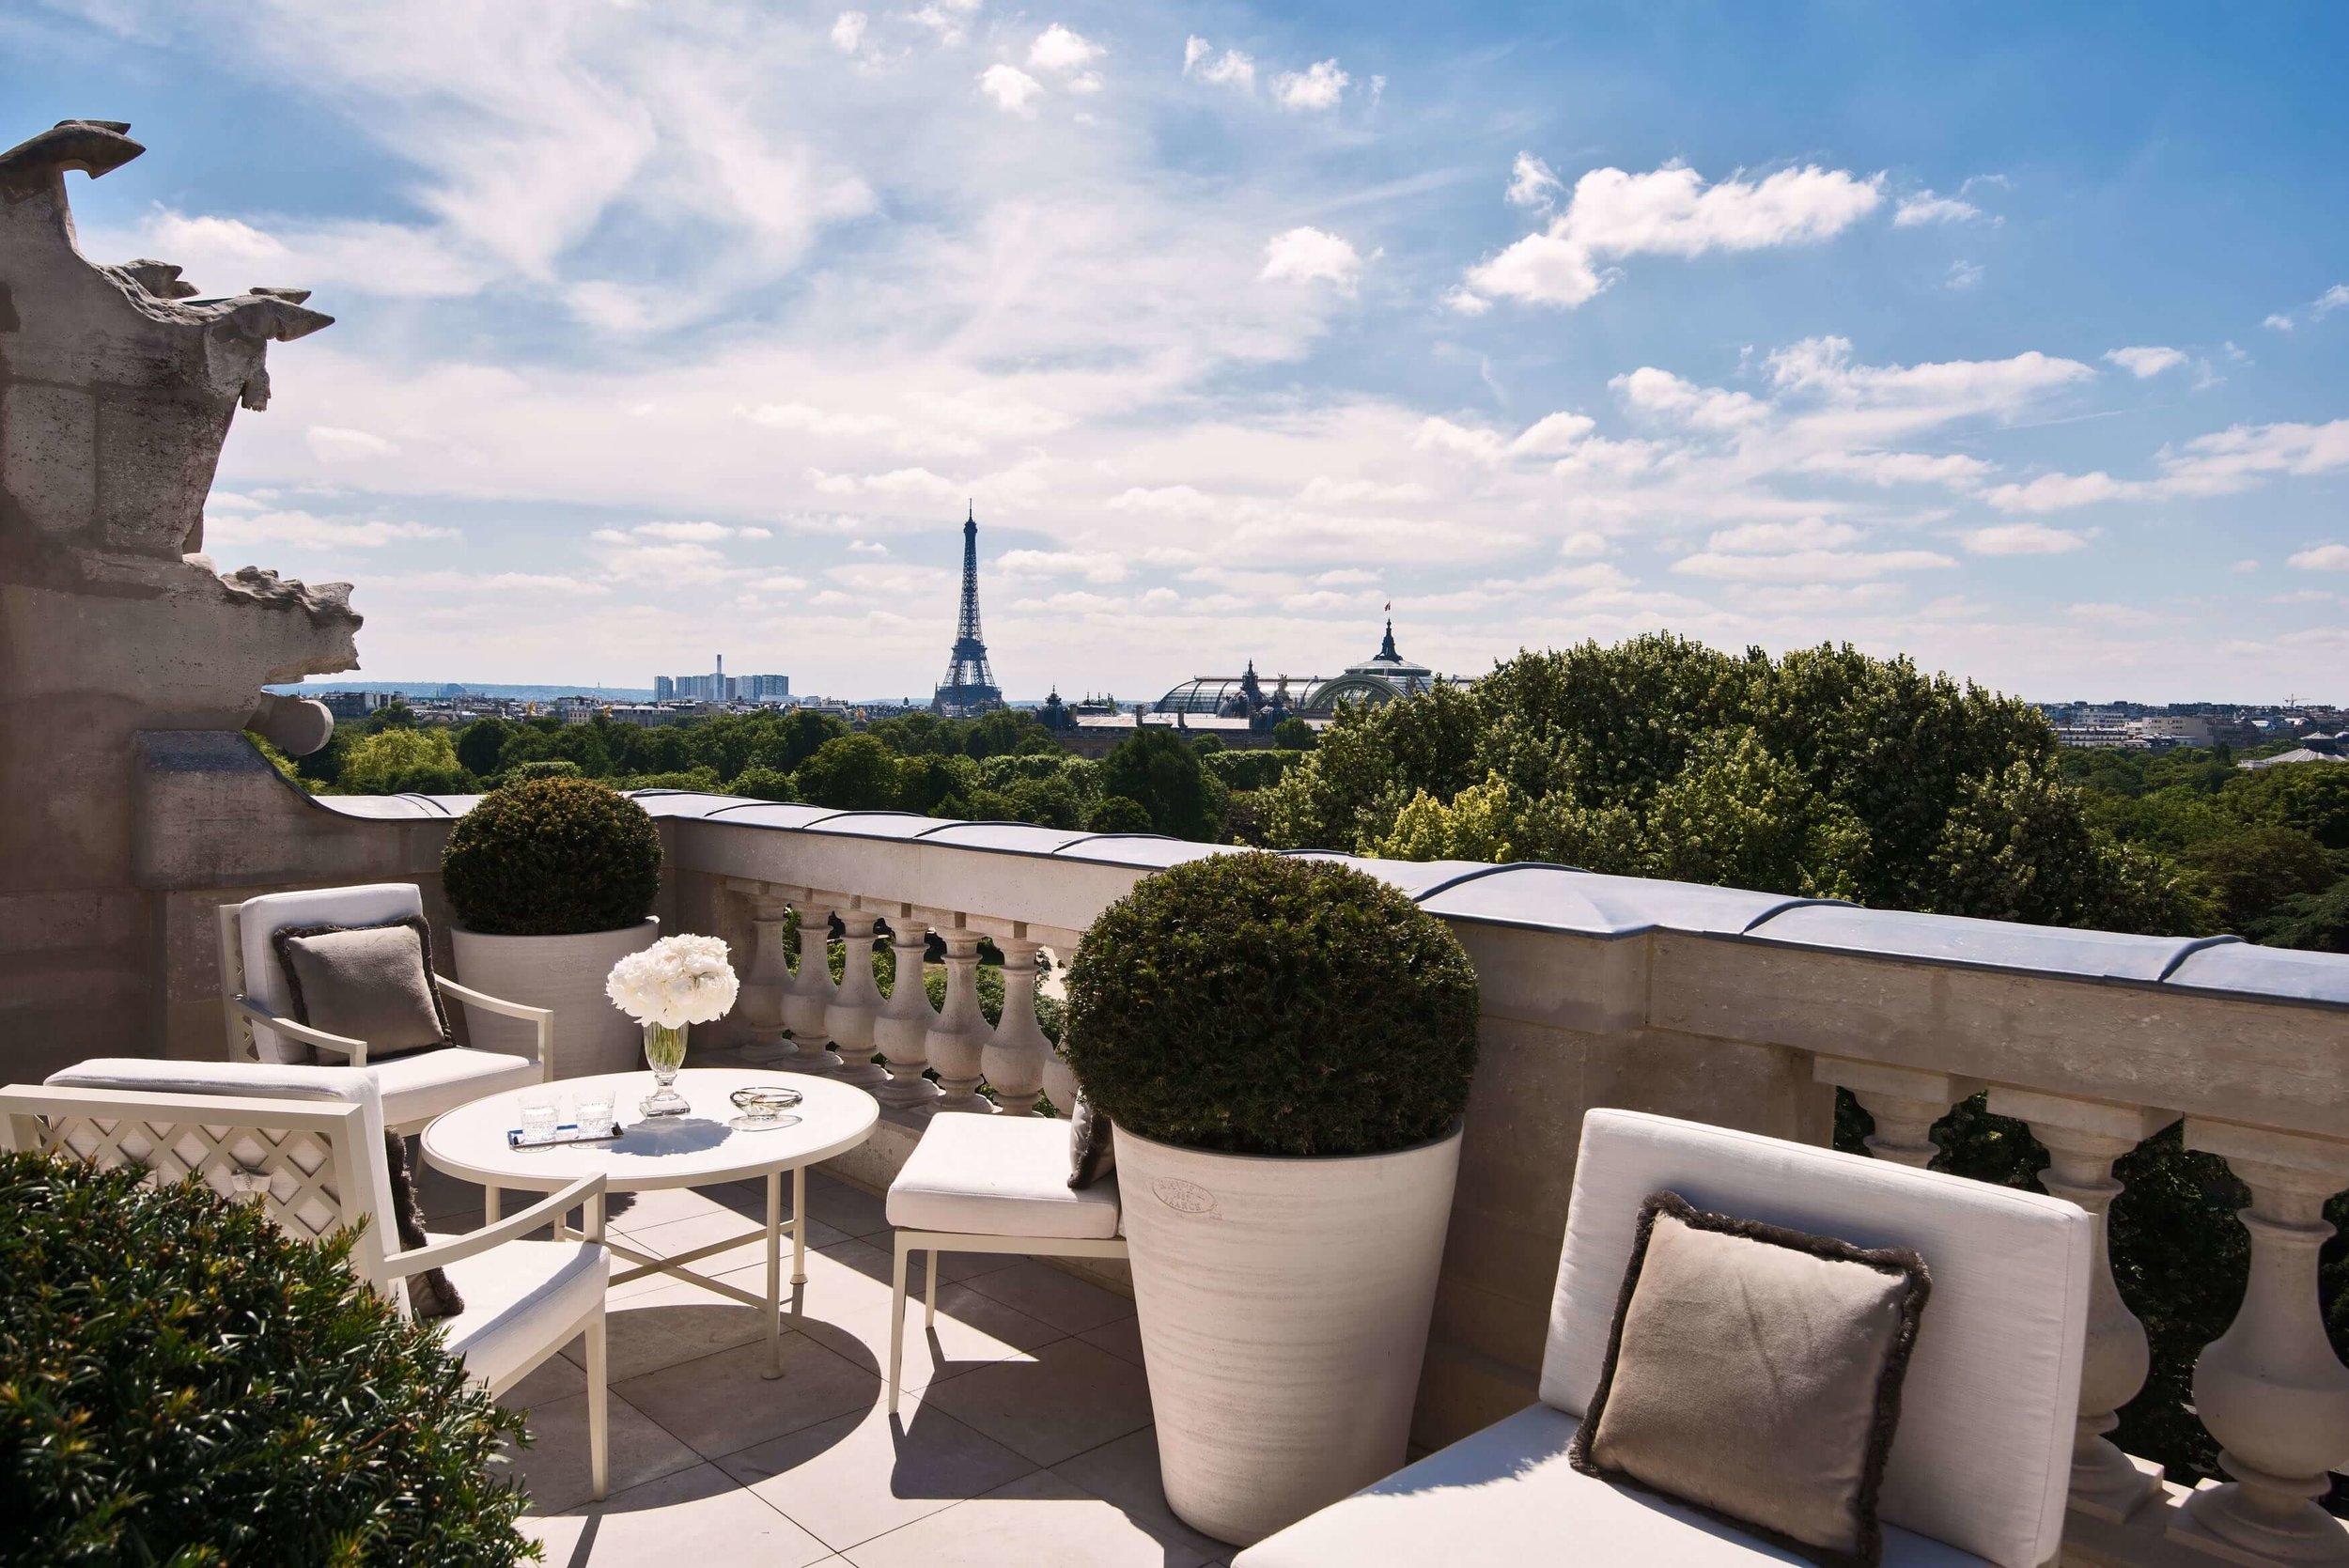 Hotel de Crillon, A Rosewood Hotel - Paris, France